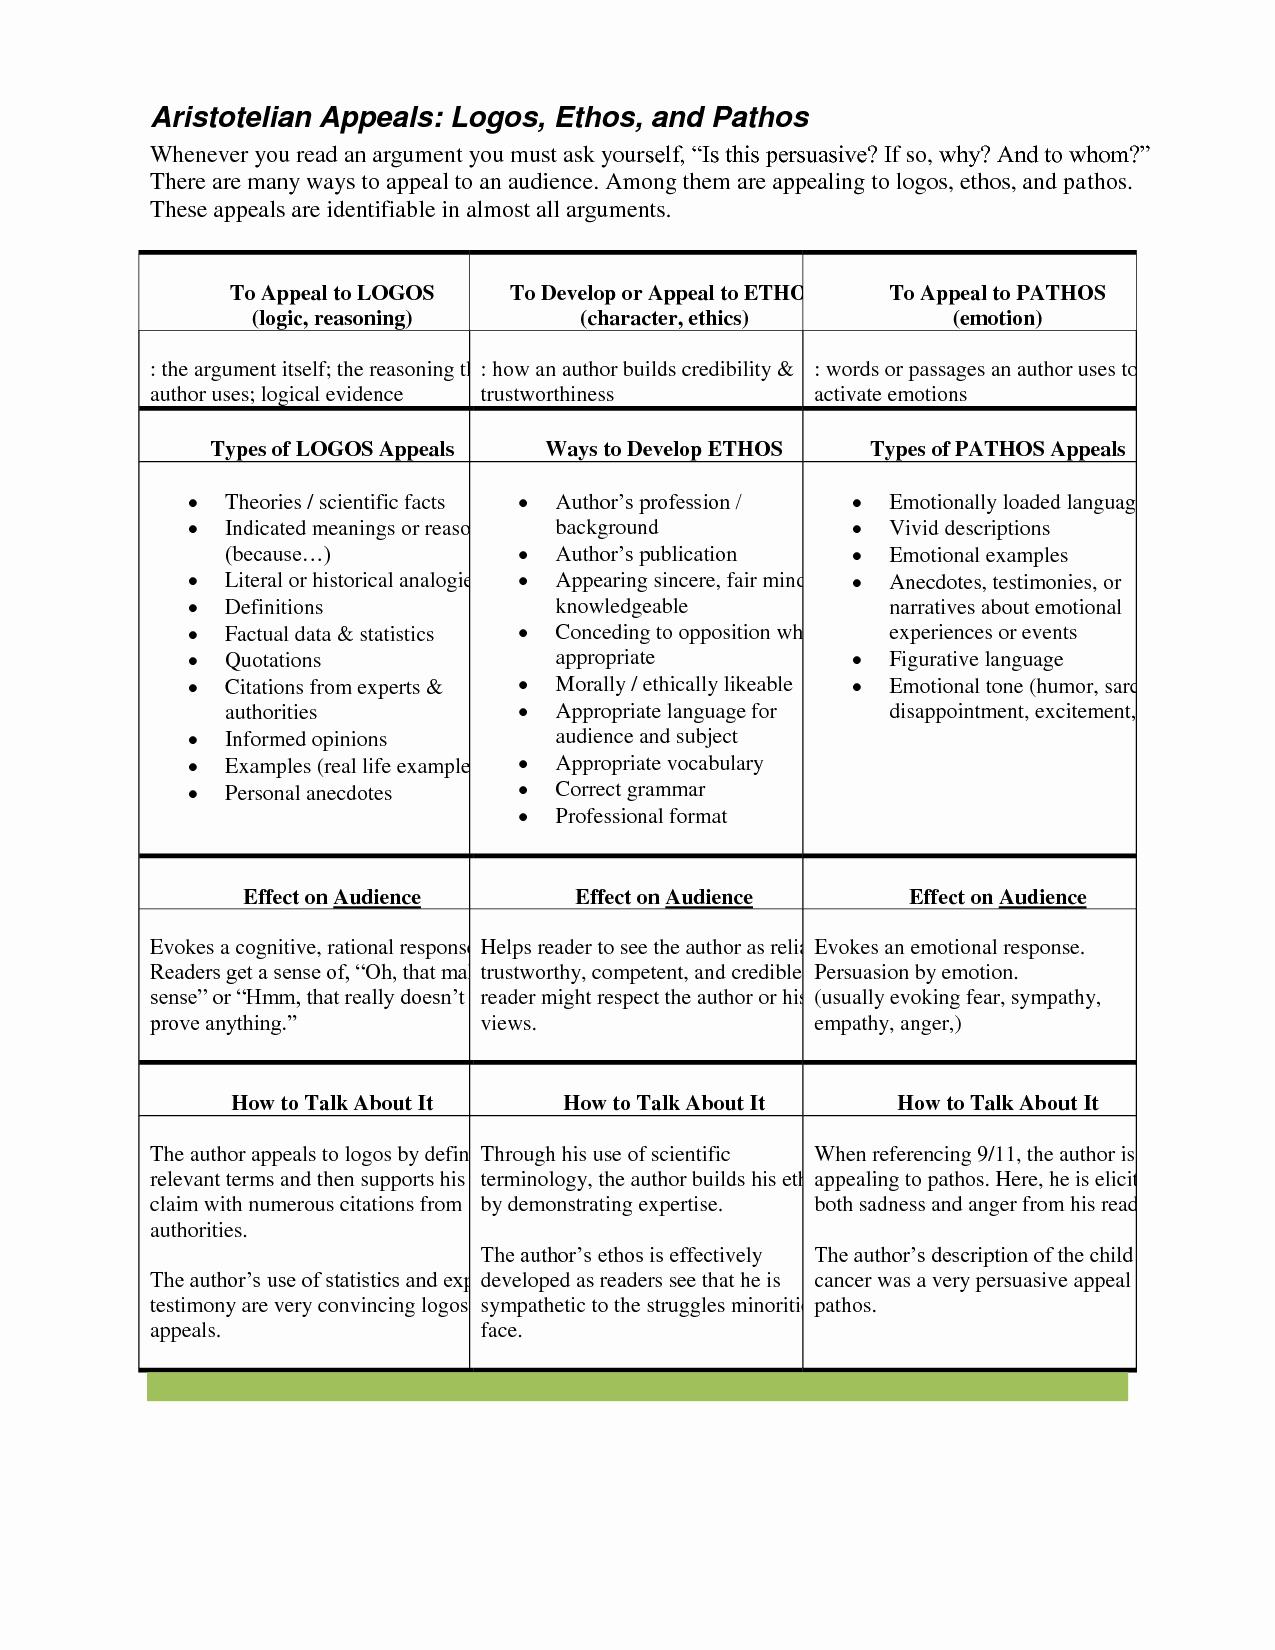 Ethos Pathos Logos Worksheet Answers Best Of Ethos Pathos Logos Worksheet